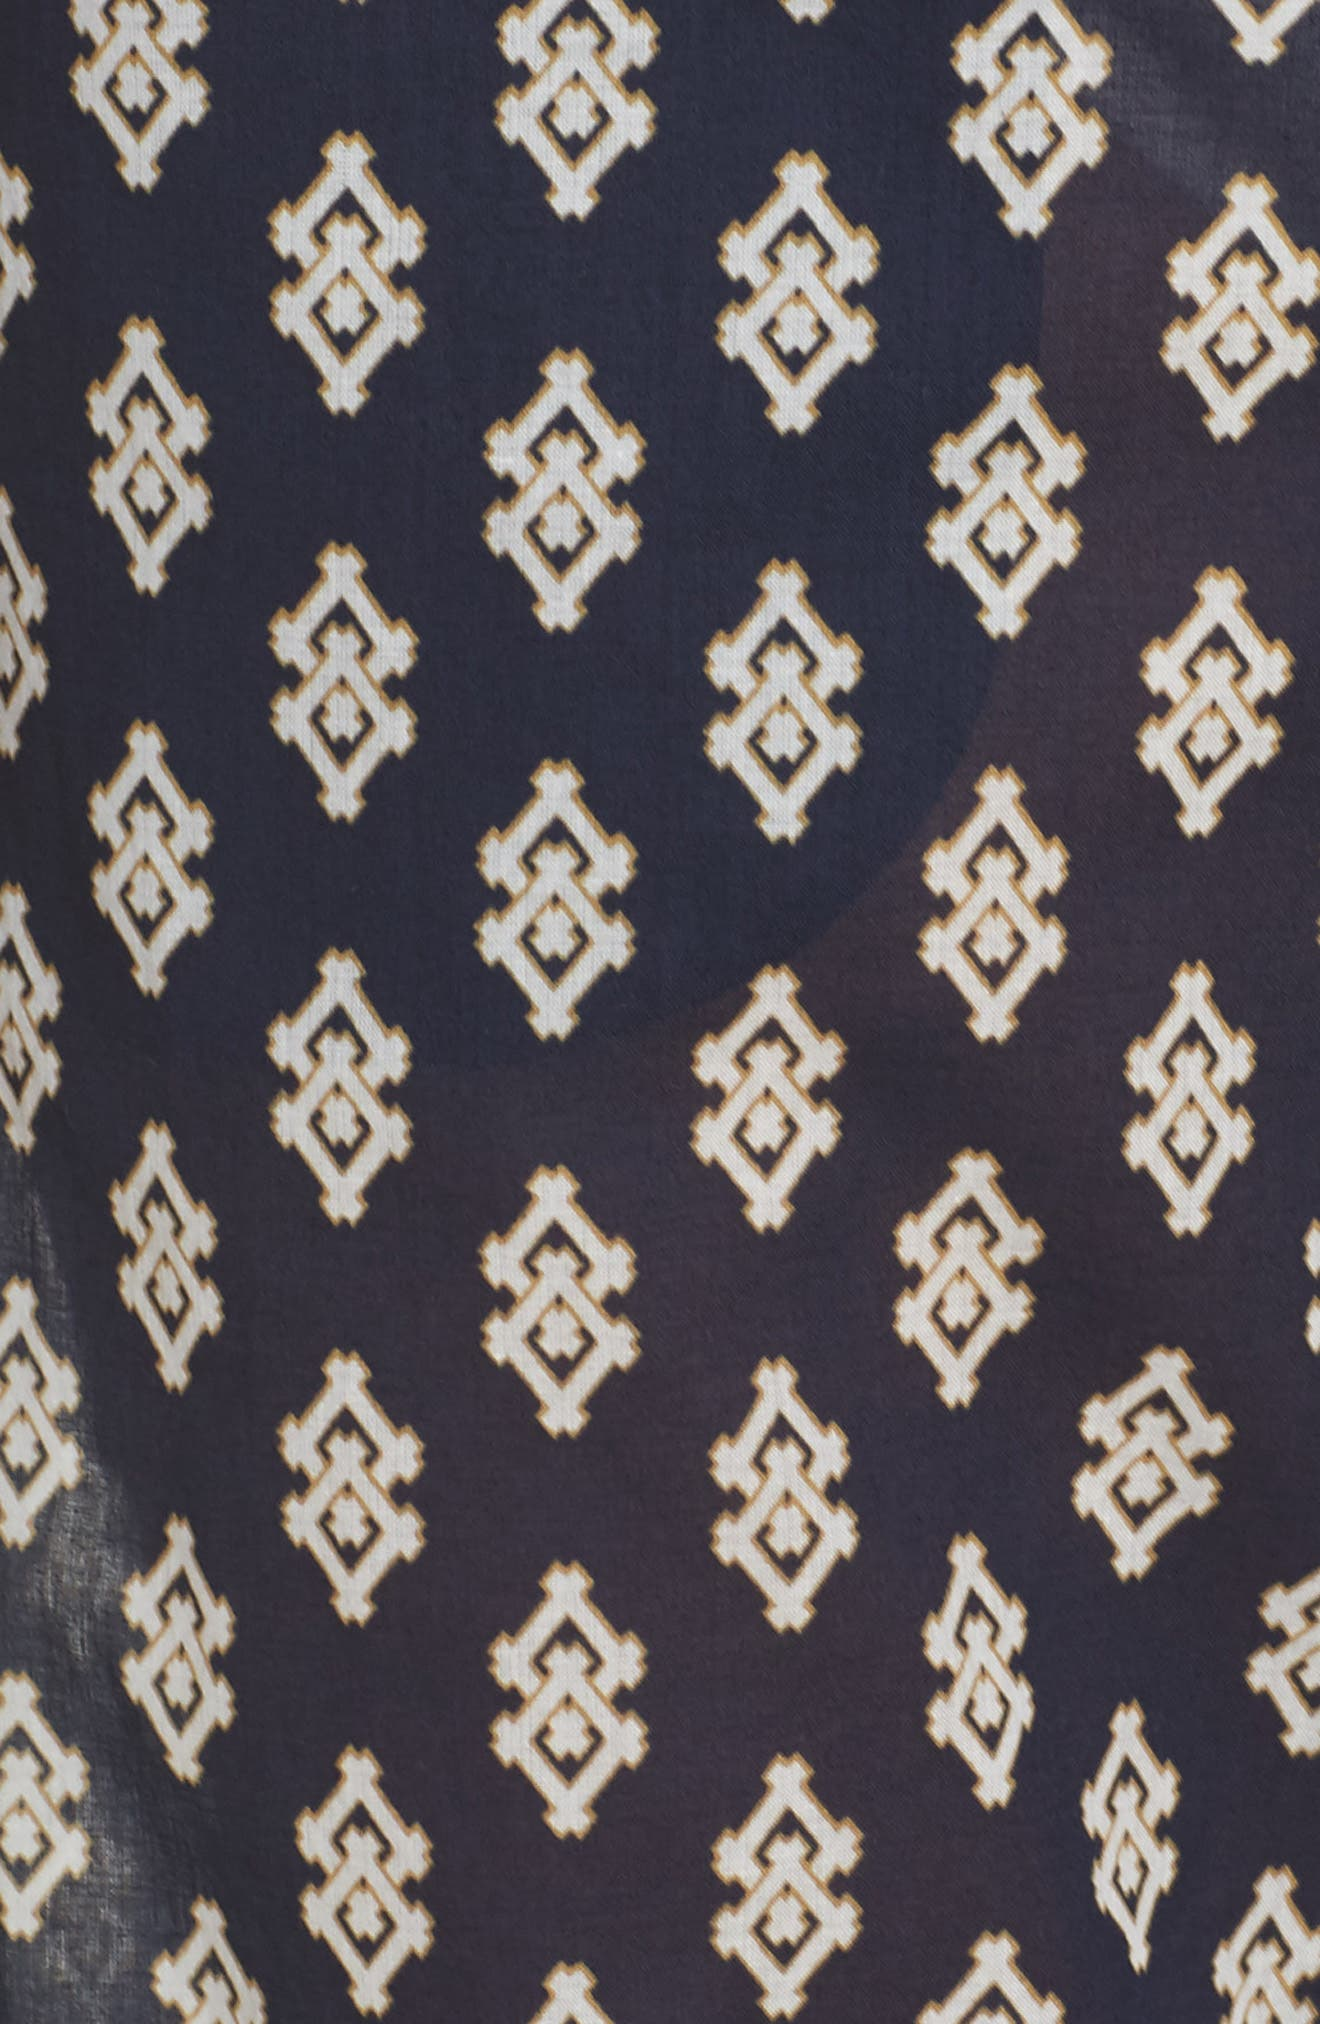 Double Diamond Cover-Up Pants,                             Alternate thumbnail 5, color,